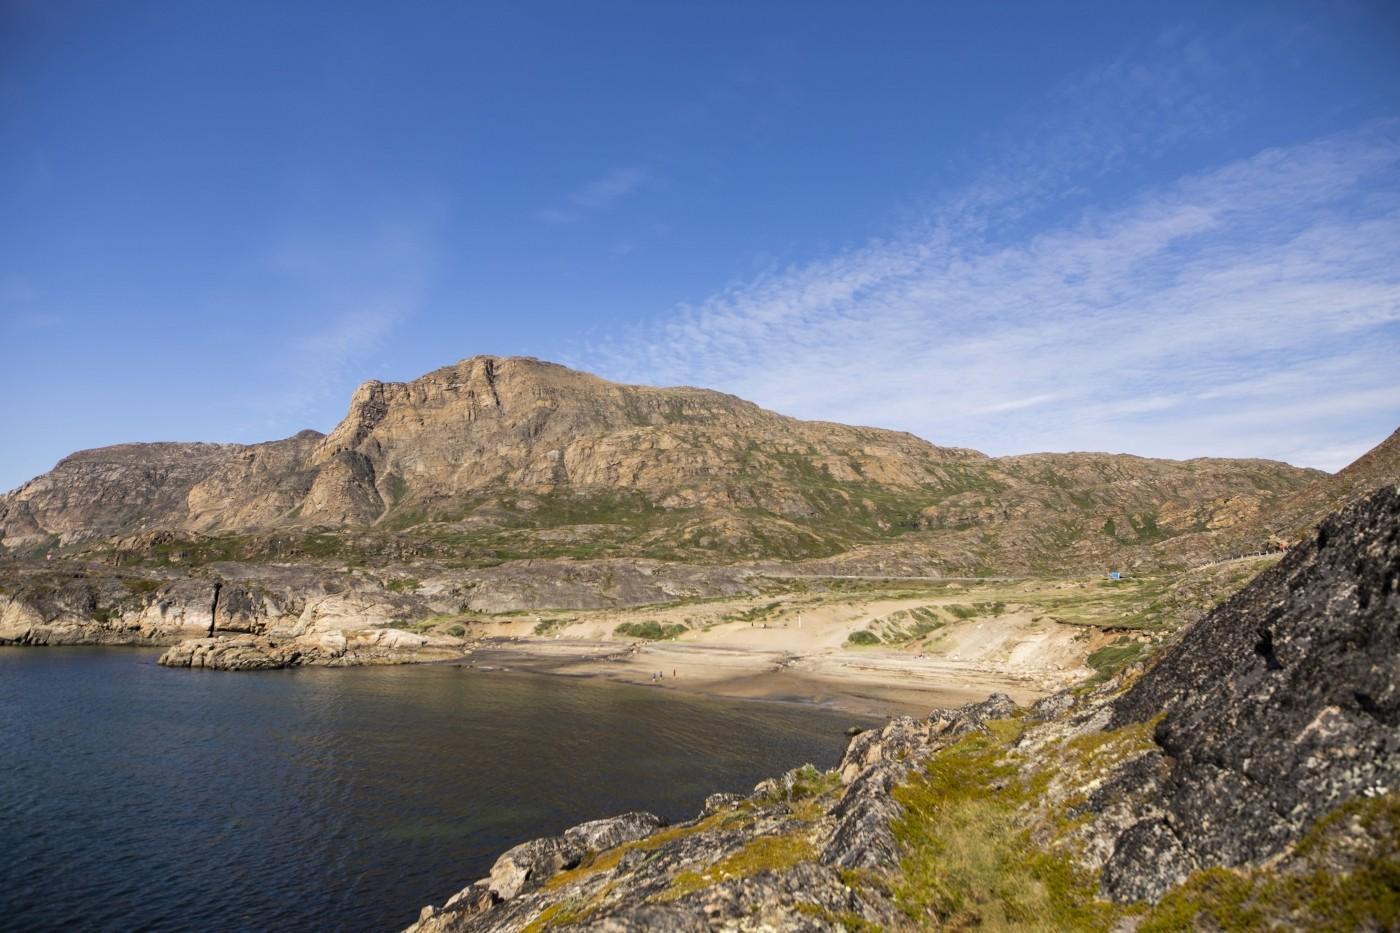 Sandy Beach in Sisimiut. Photo by Aningaaq R Carlsen - Visit Greenland